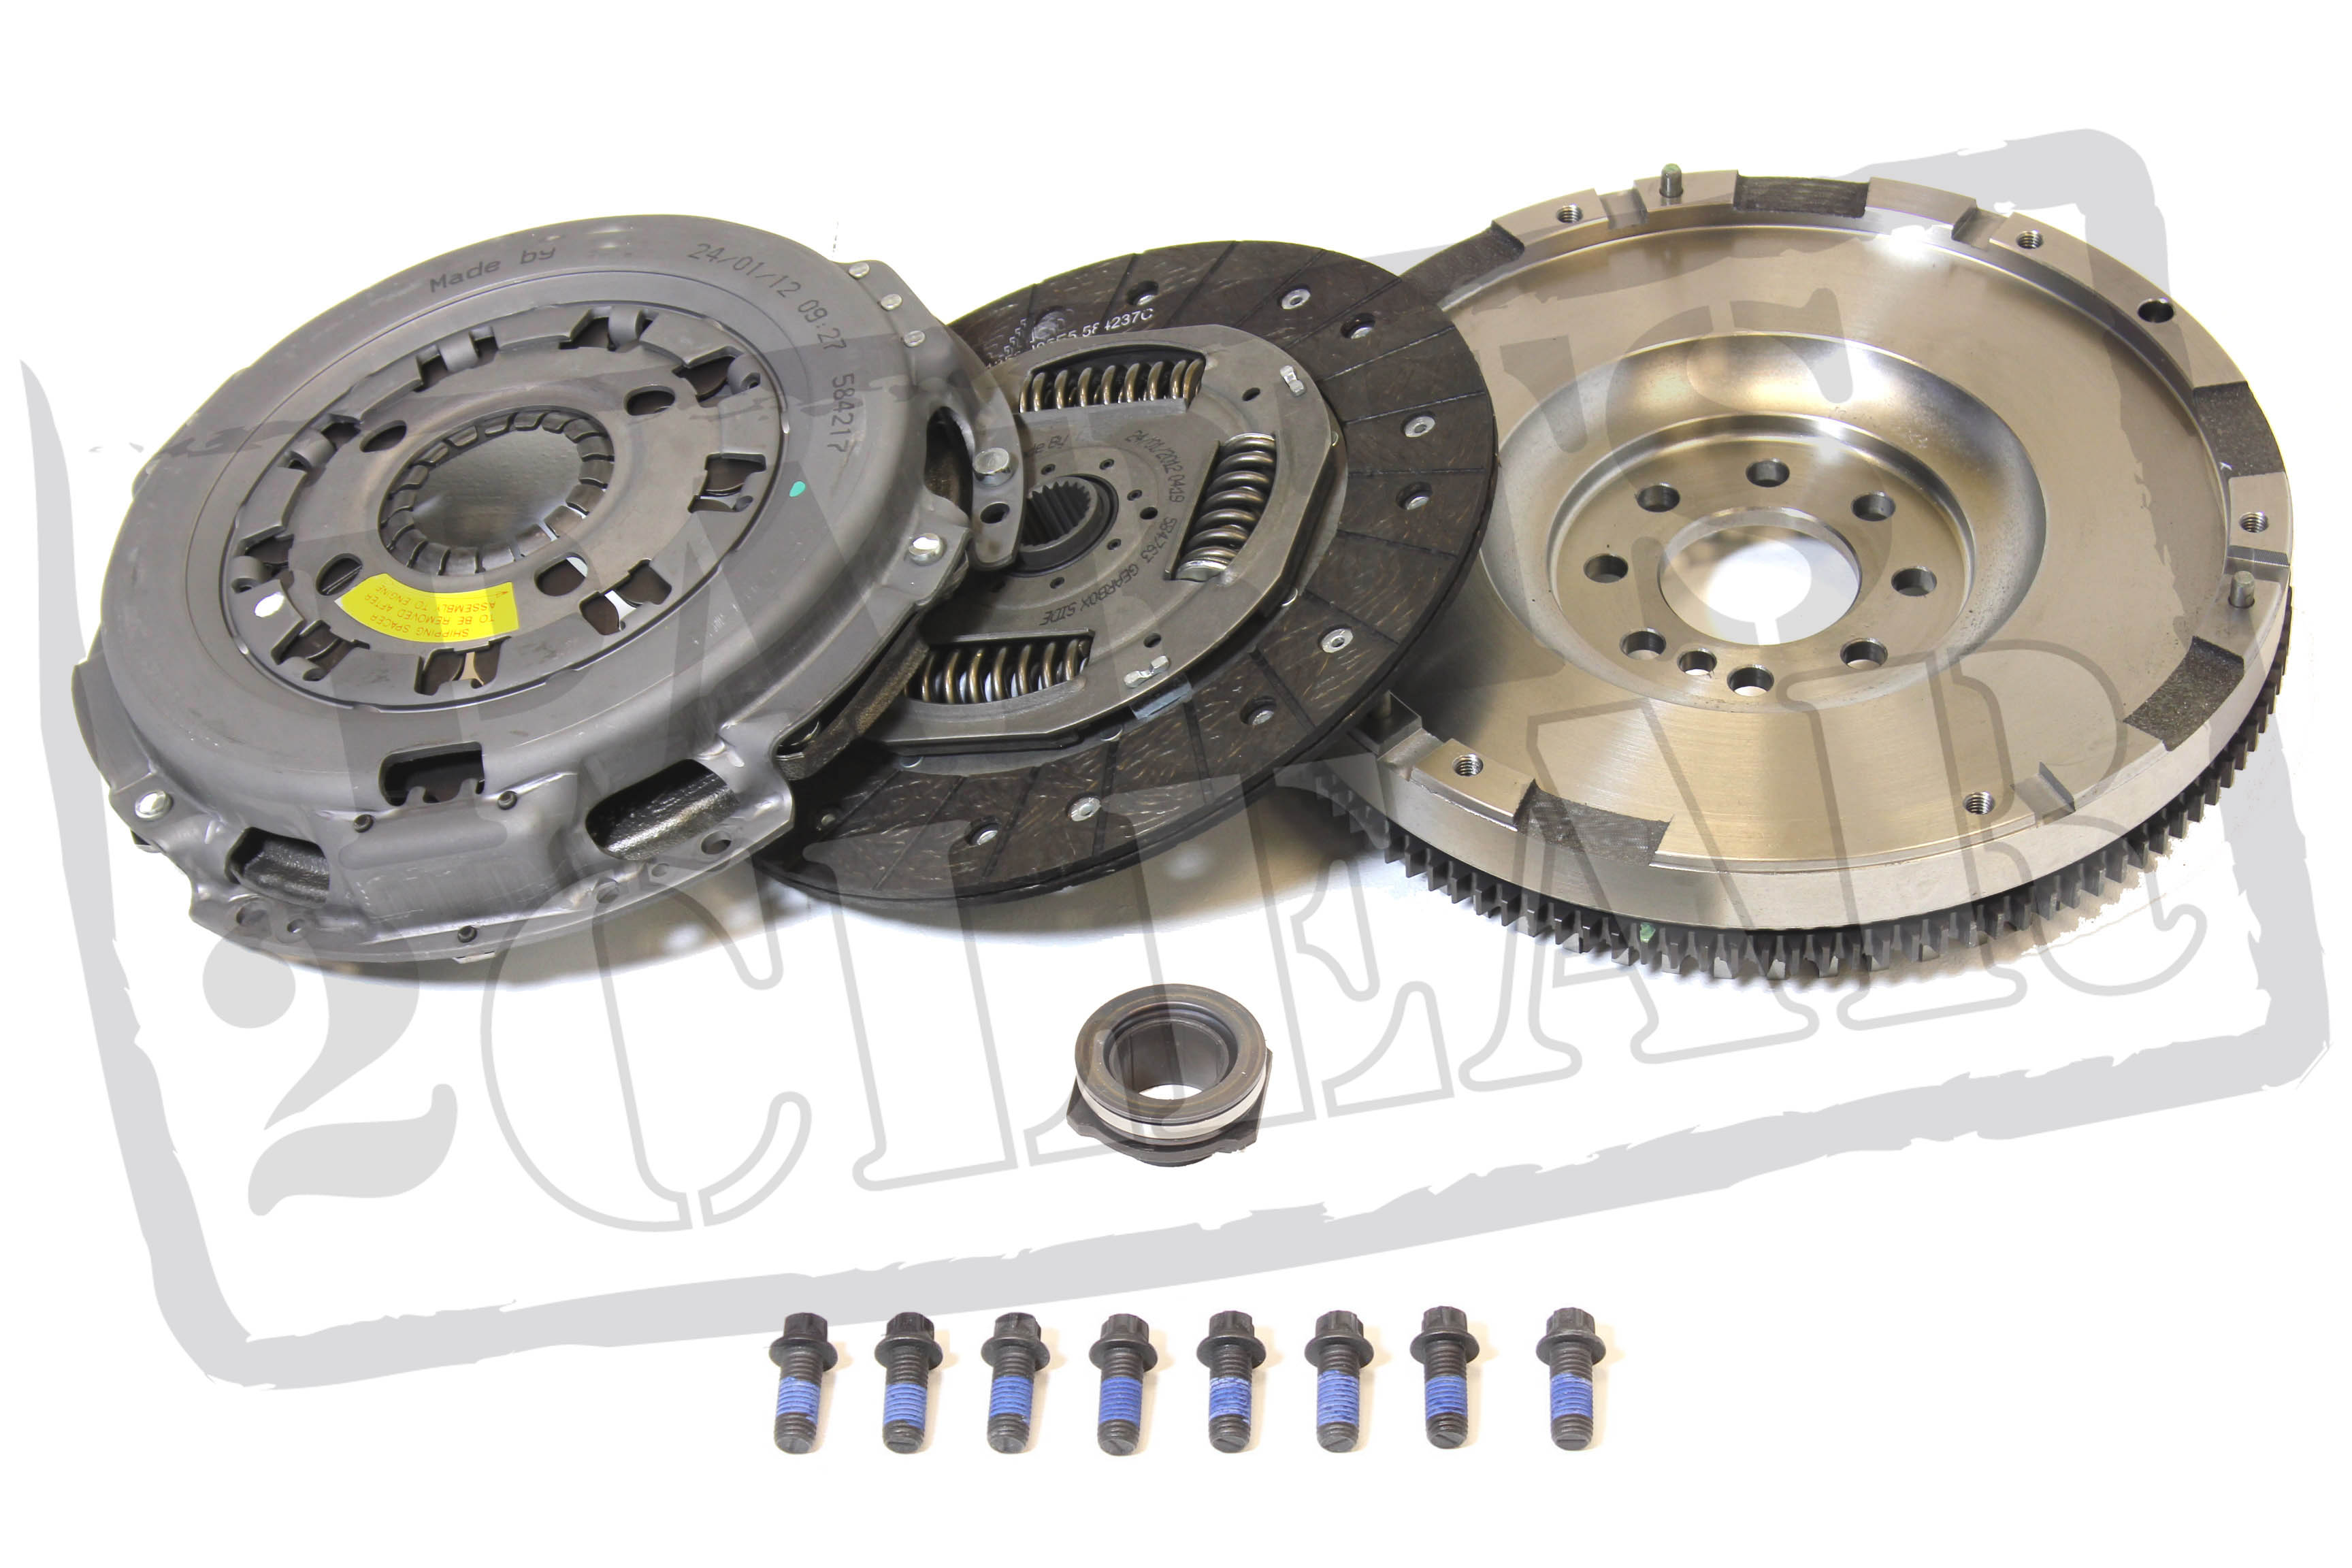 Audi A6 1.8 Turbo Solid Flywheel Conversion Kit 150 Saloon 1/97 -5/